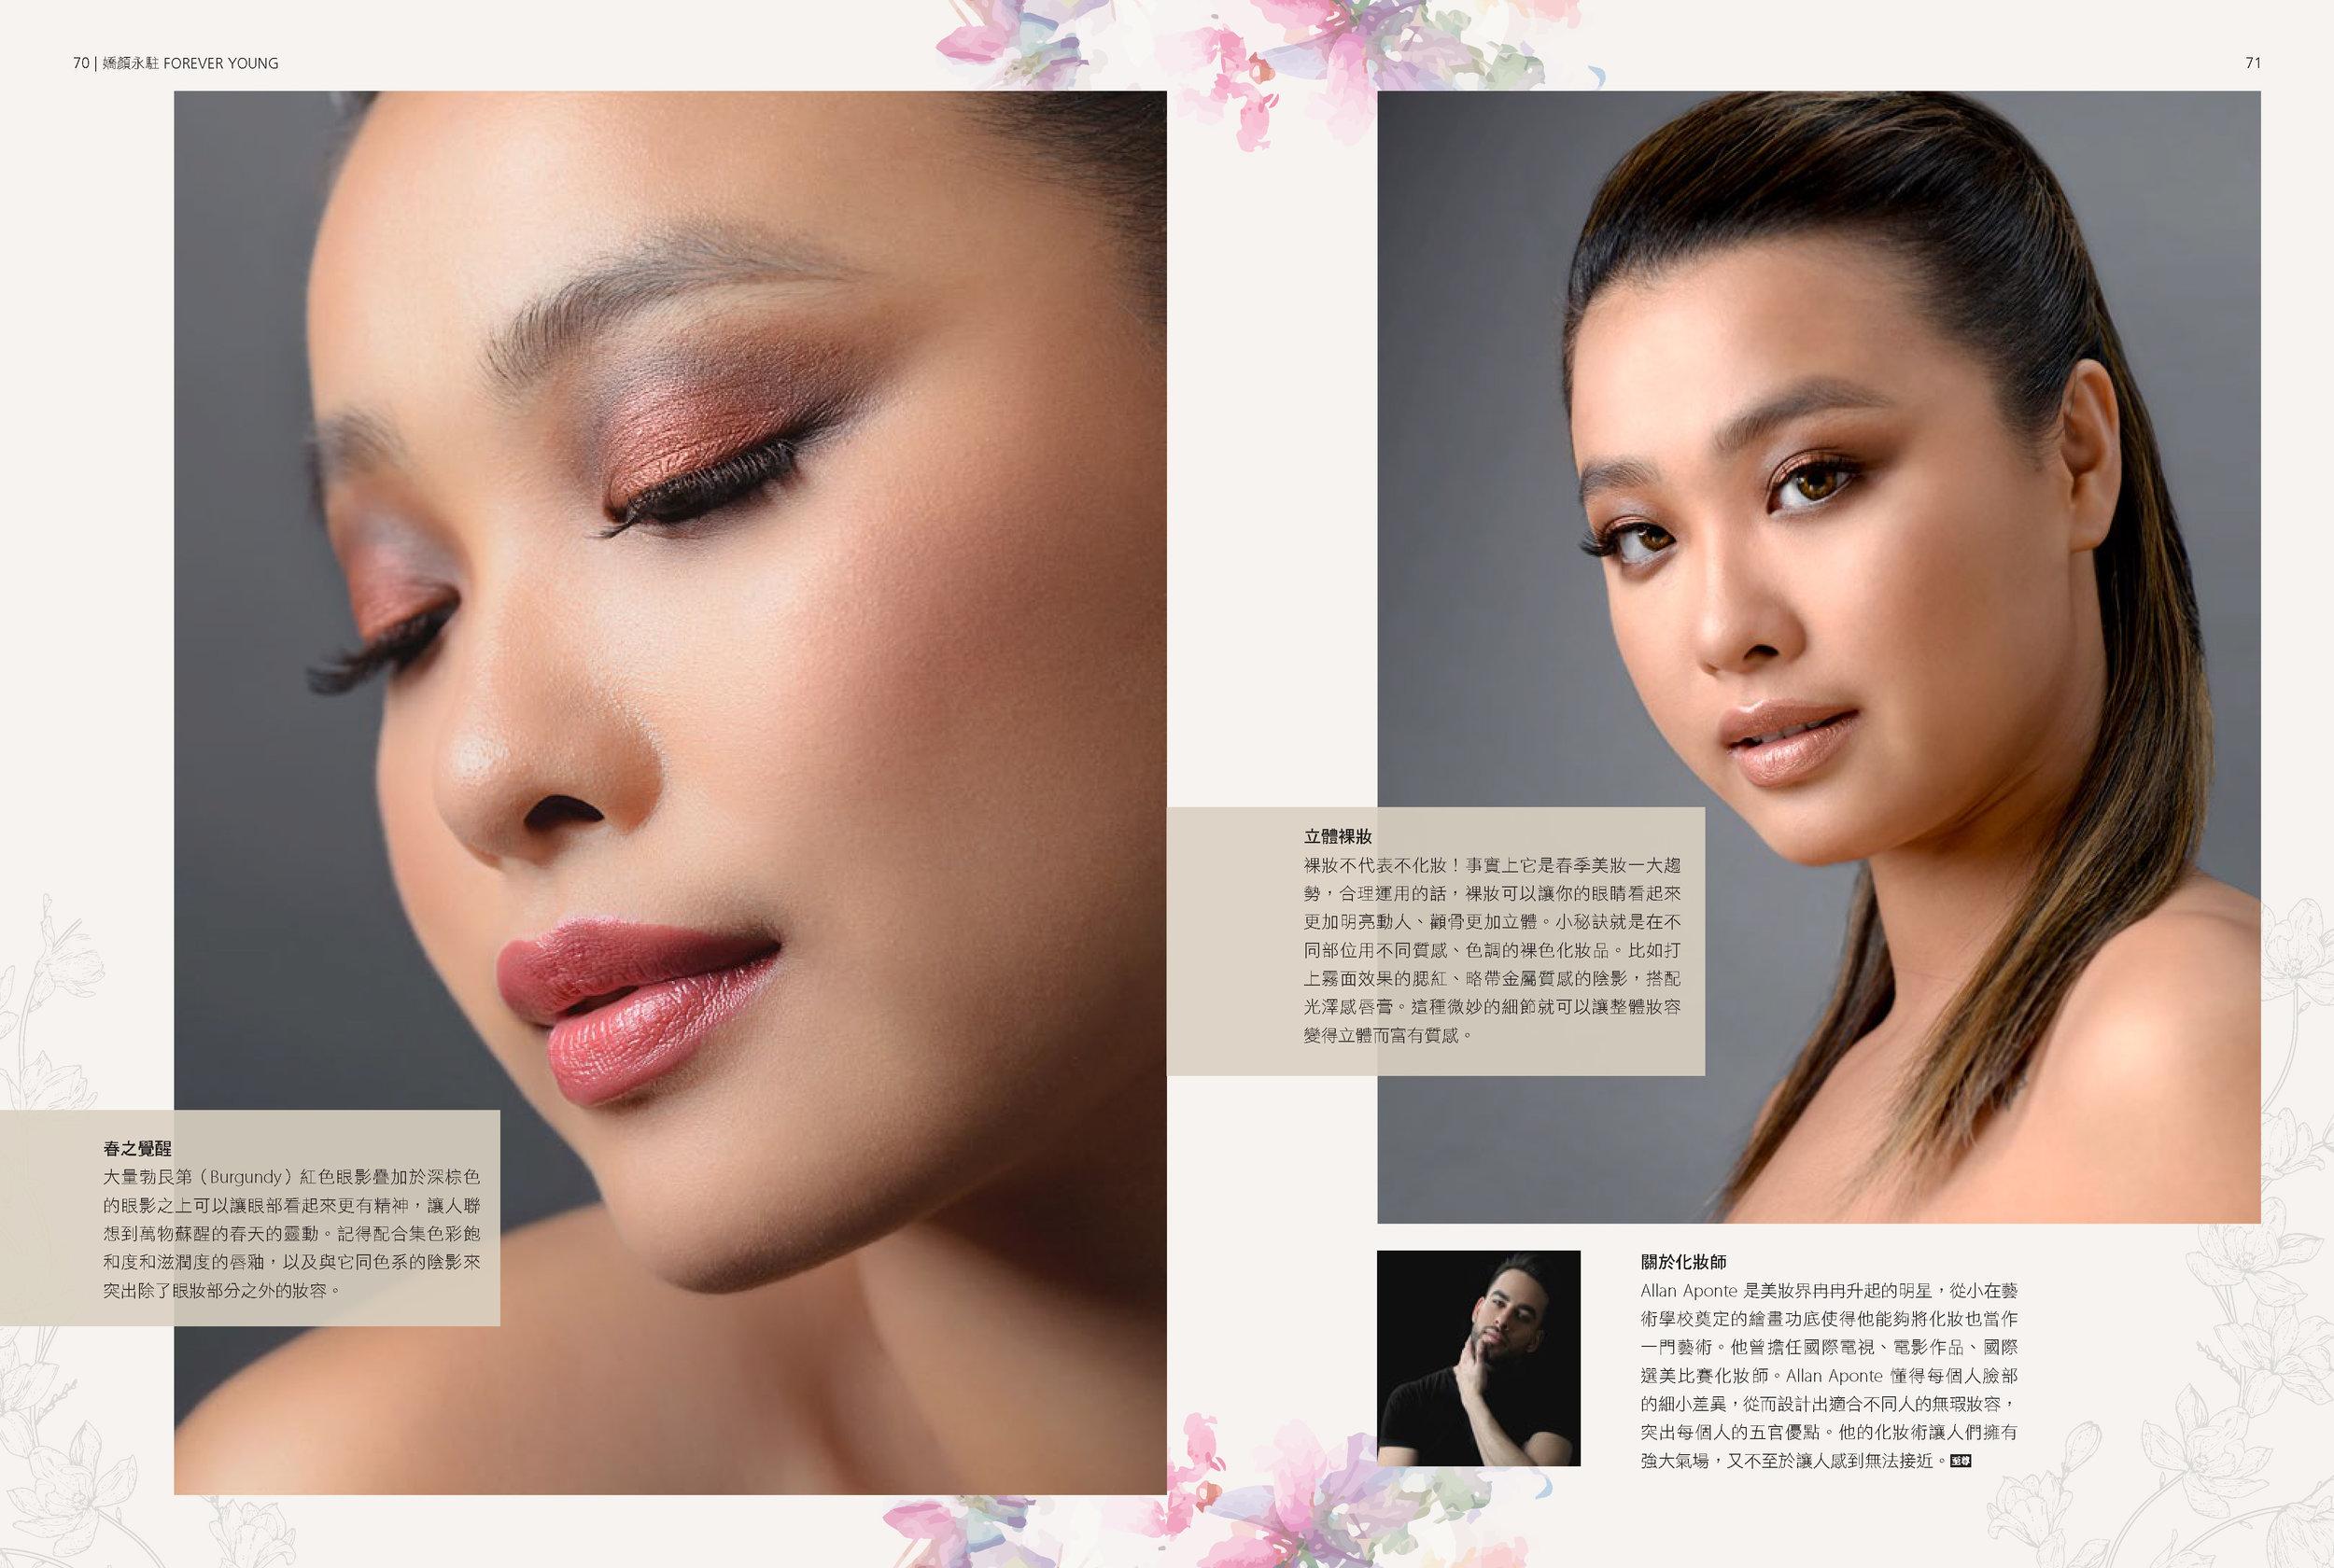 Pure Luxury Magazine - MarApr 2019-Makeup by Allan Aponte, photos by Andrew Werner 2.jpg